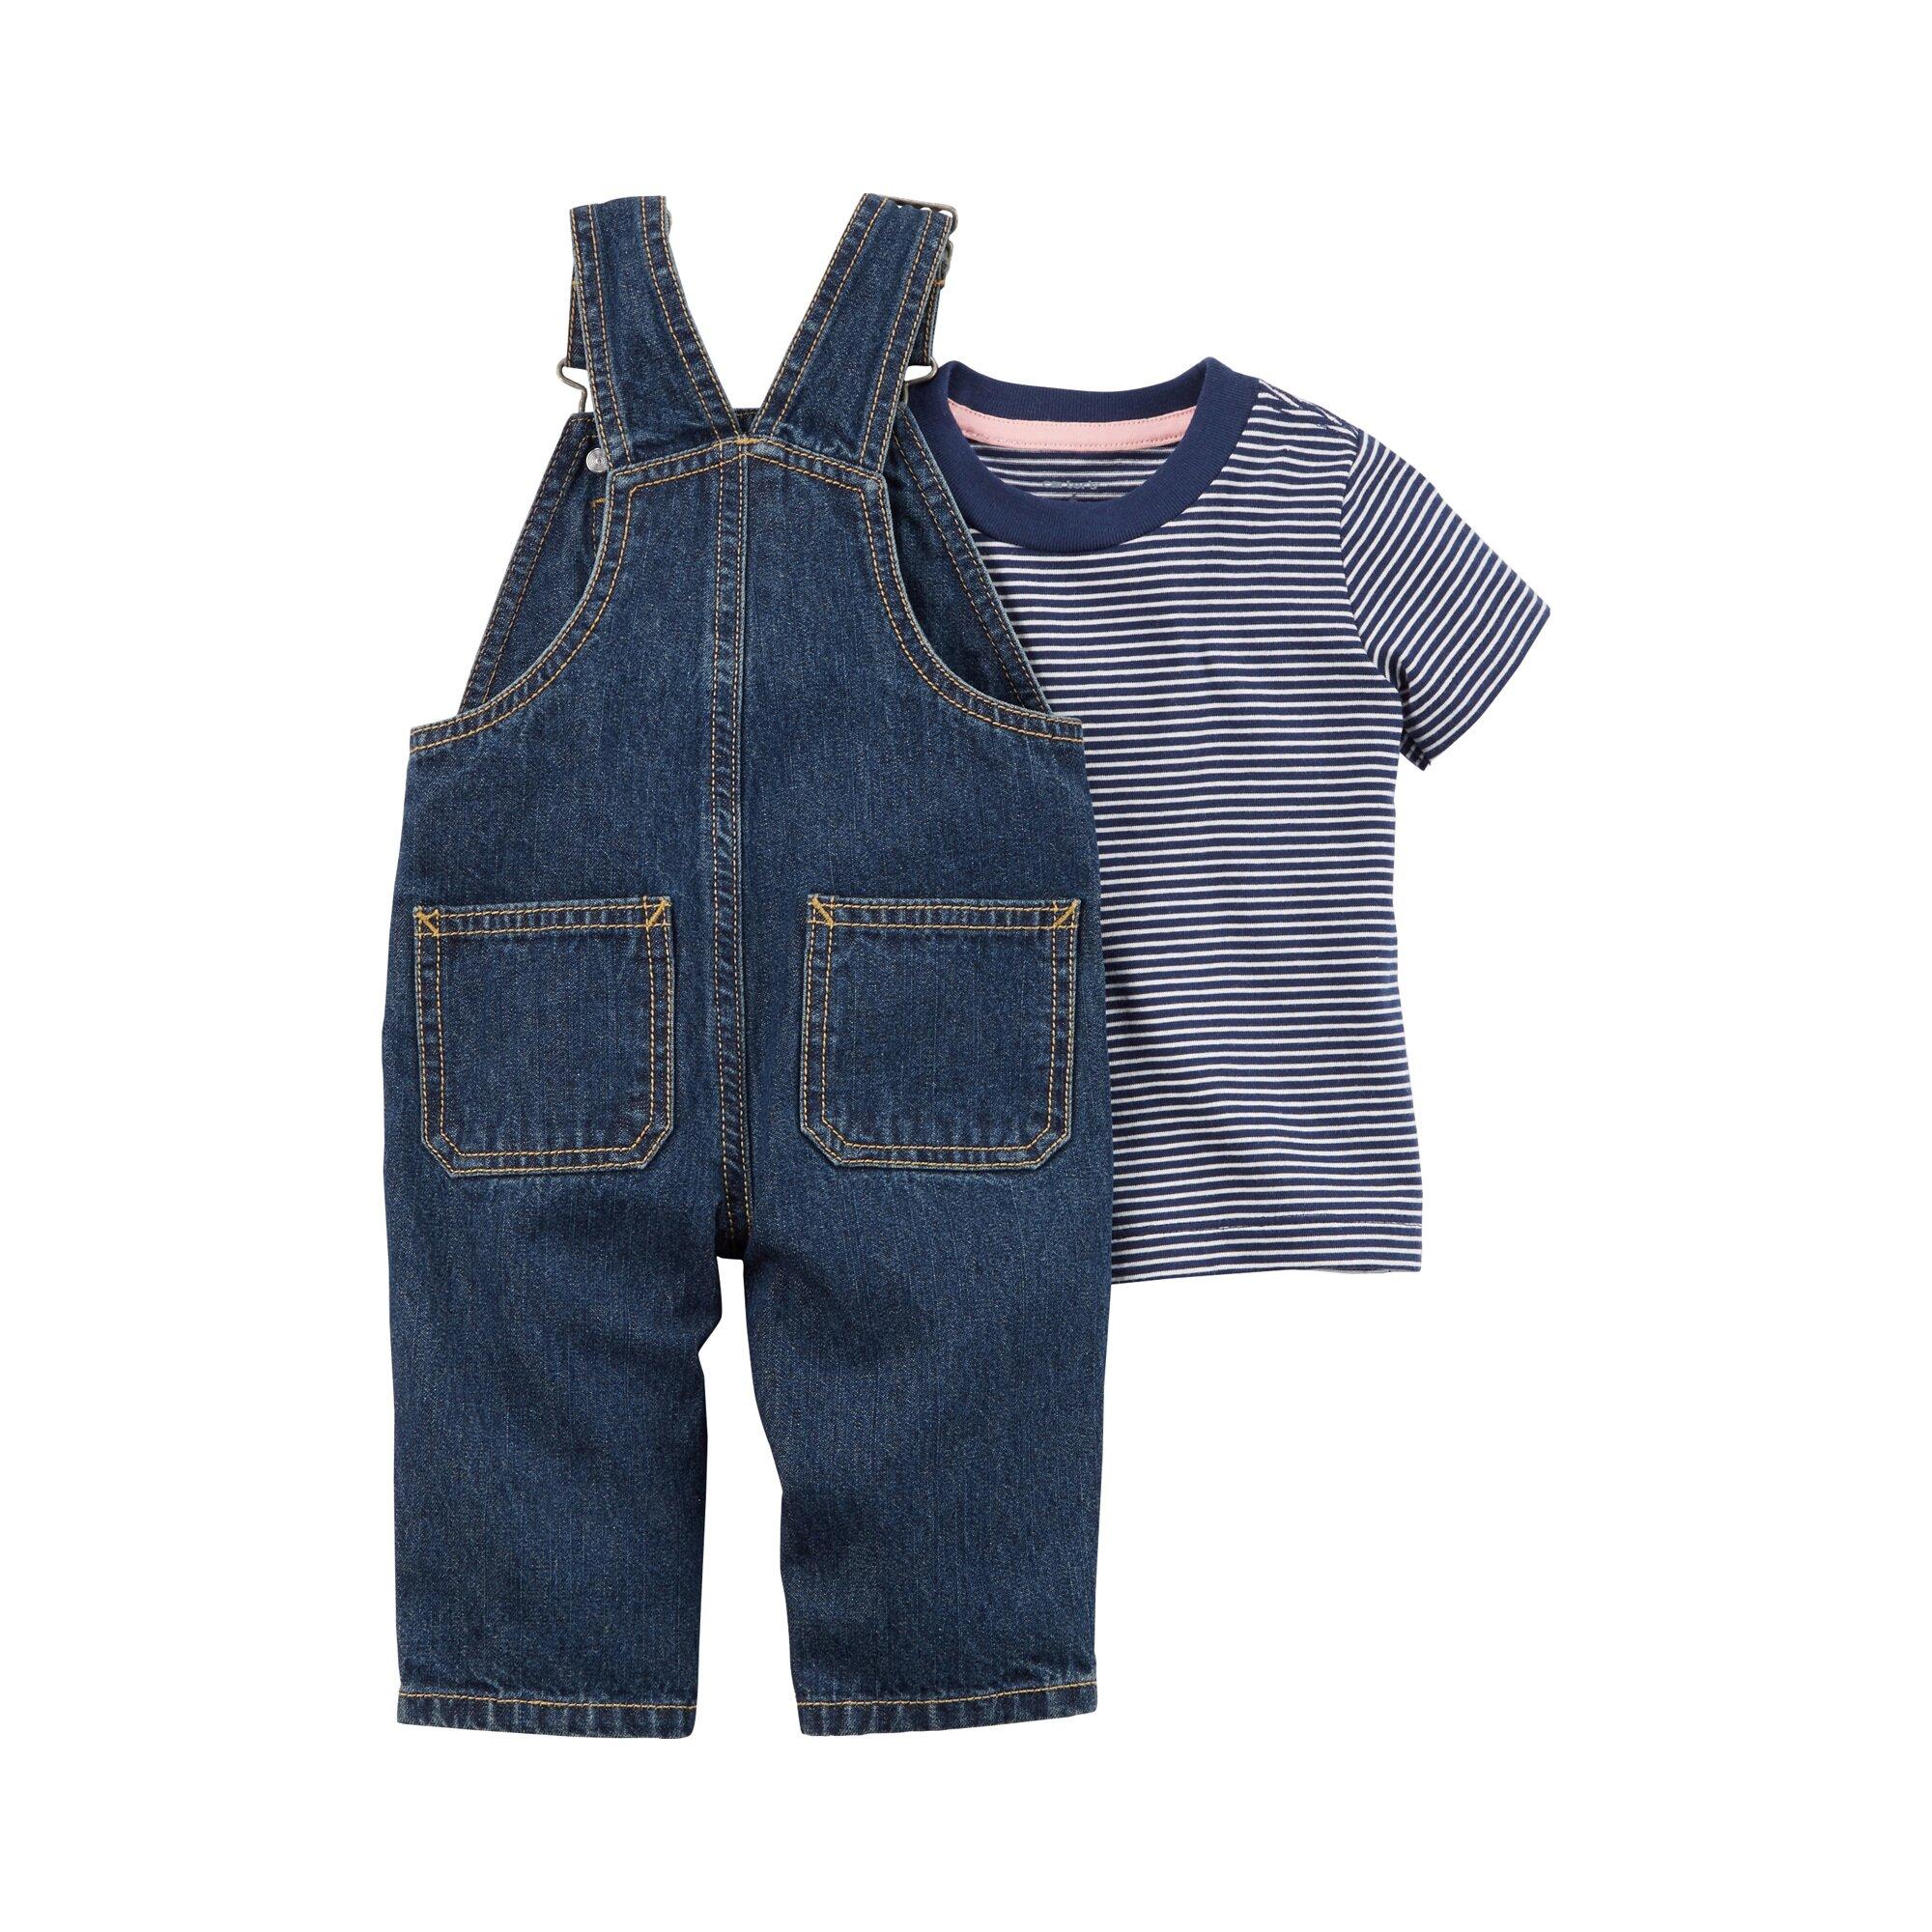 carter-s-2-tlg-set-t-shirt-und-jeans-latzhose